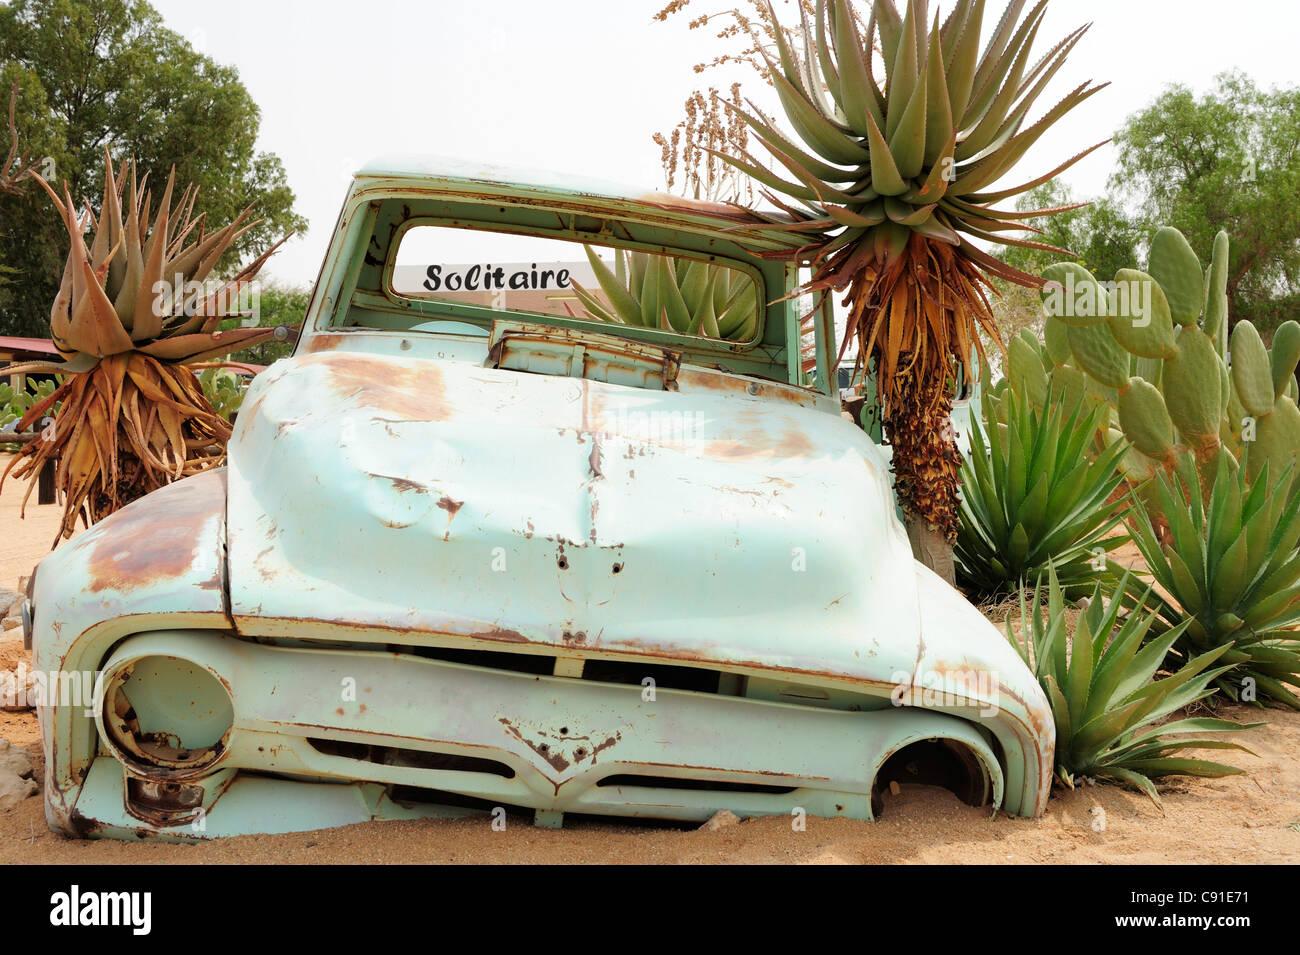 Car wreck standing in sand between cactus, Solitaire, near Namib Naucluft National Park, Namib desert, Namibia - Stock Image